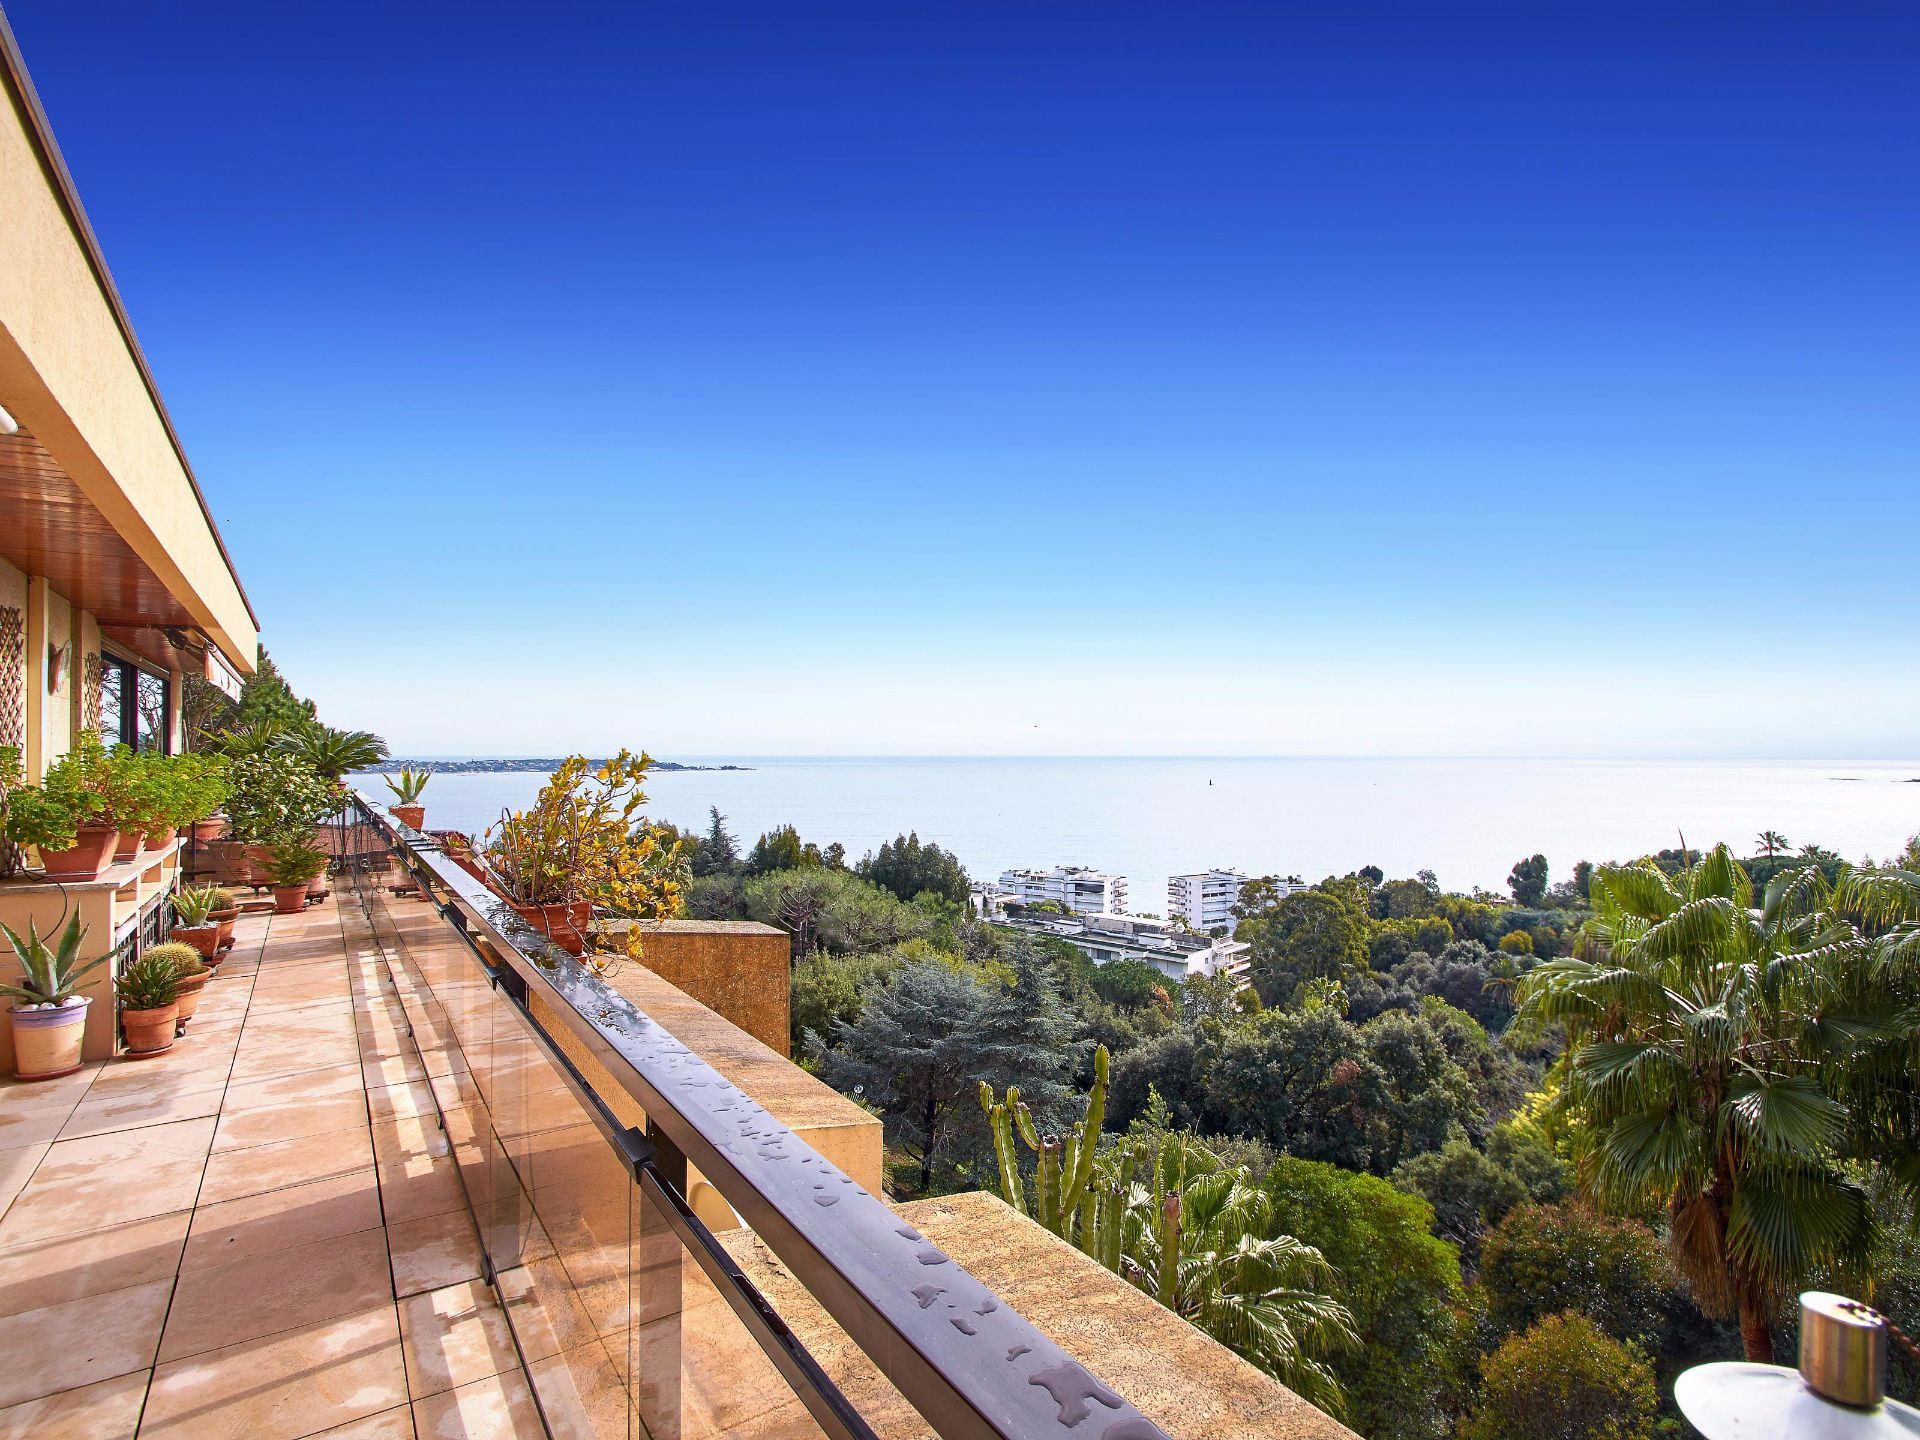 公寓 为 销售 在 Sole agent - In the heart of Cannes Eden, apartment with sea views 坎尼, 普罗旺斯阿尔卑斯蓝色海岸, 06400 法国